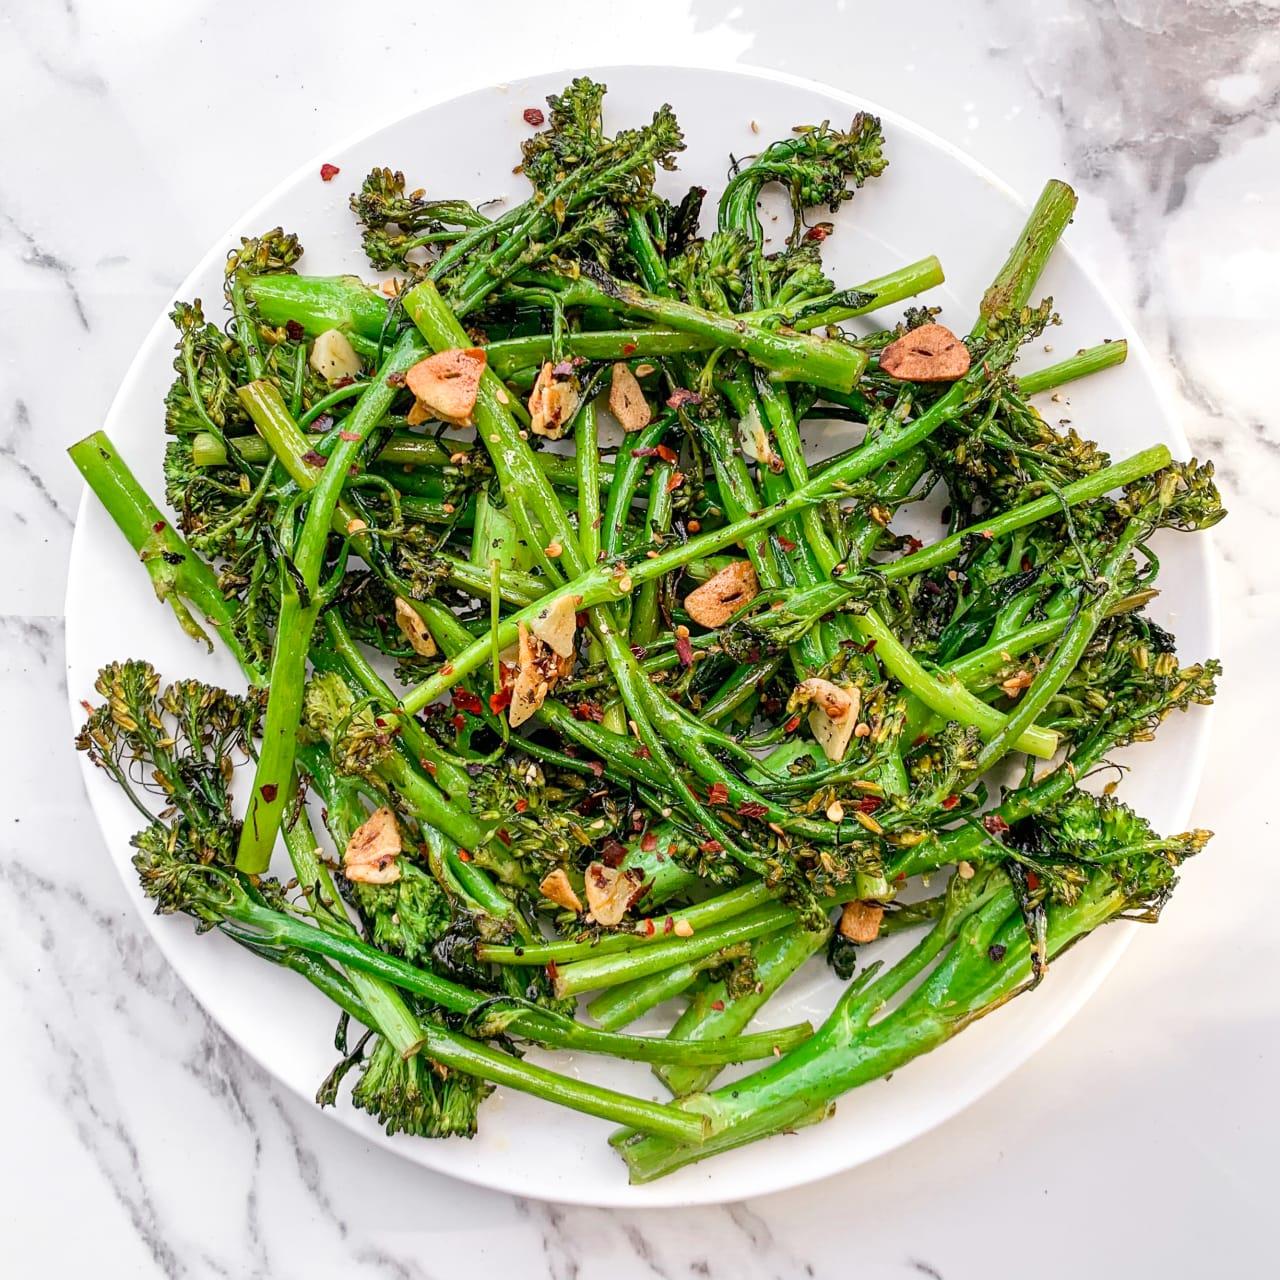 Lemon & Garlic Tenderstem Broccoli